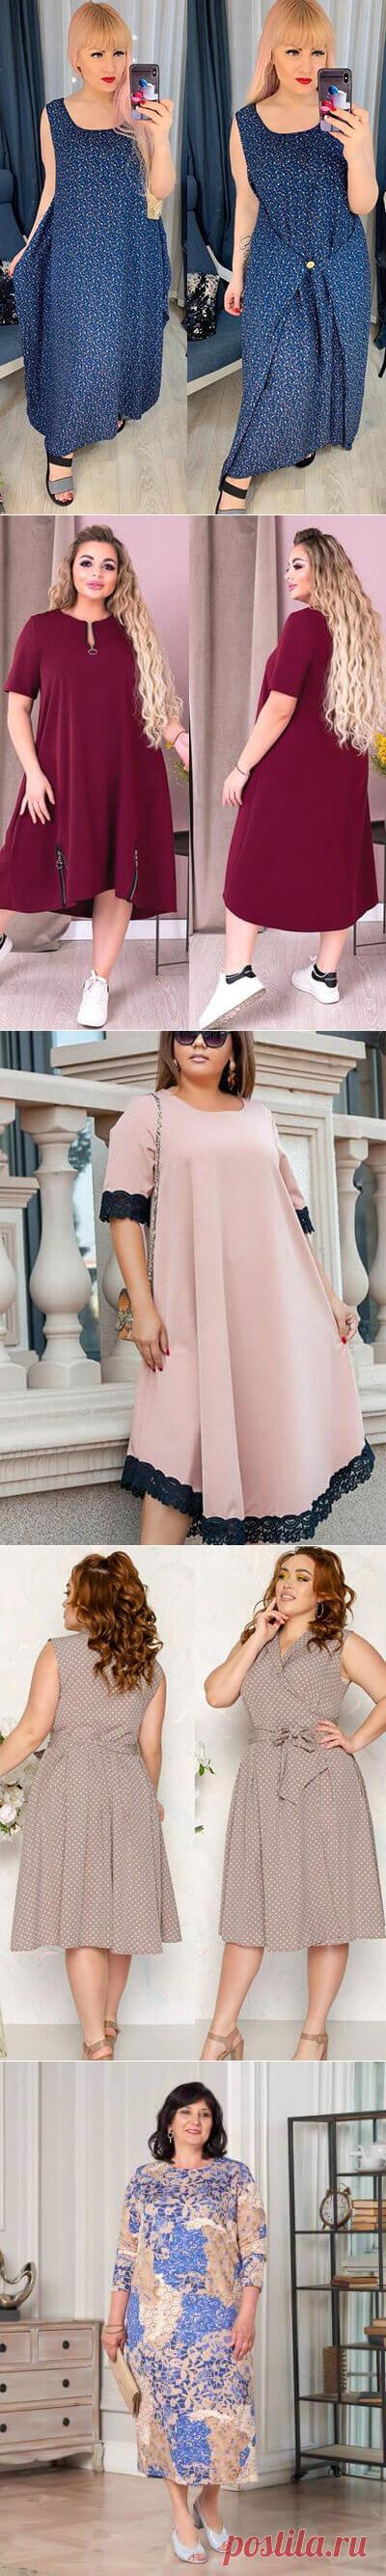 Платья Brilla